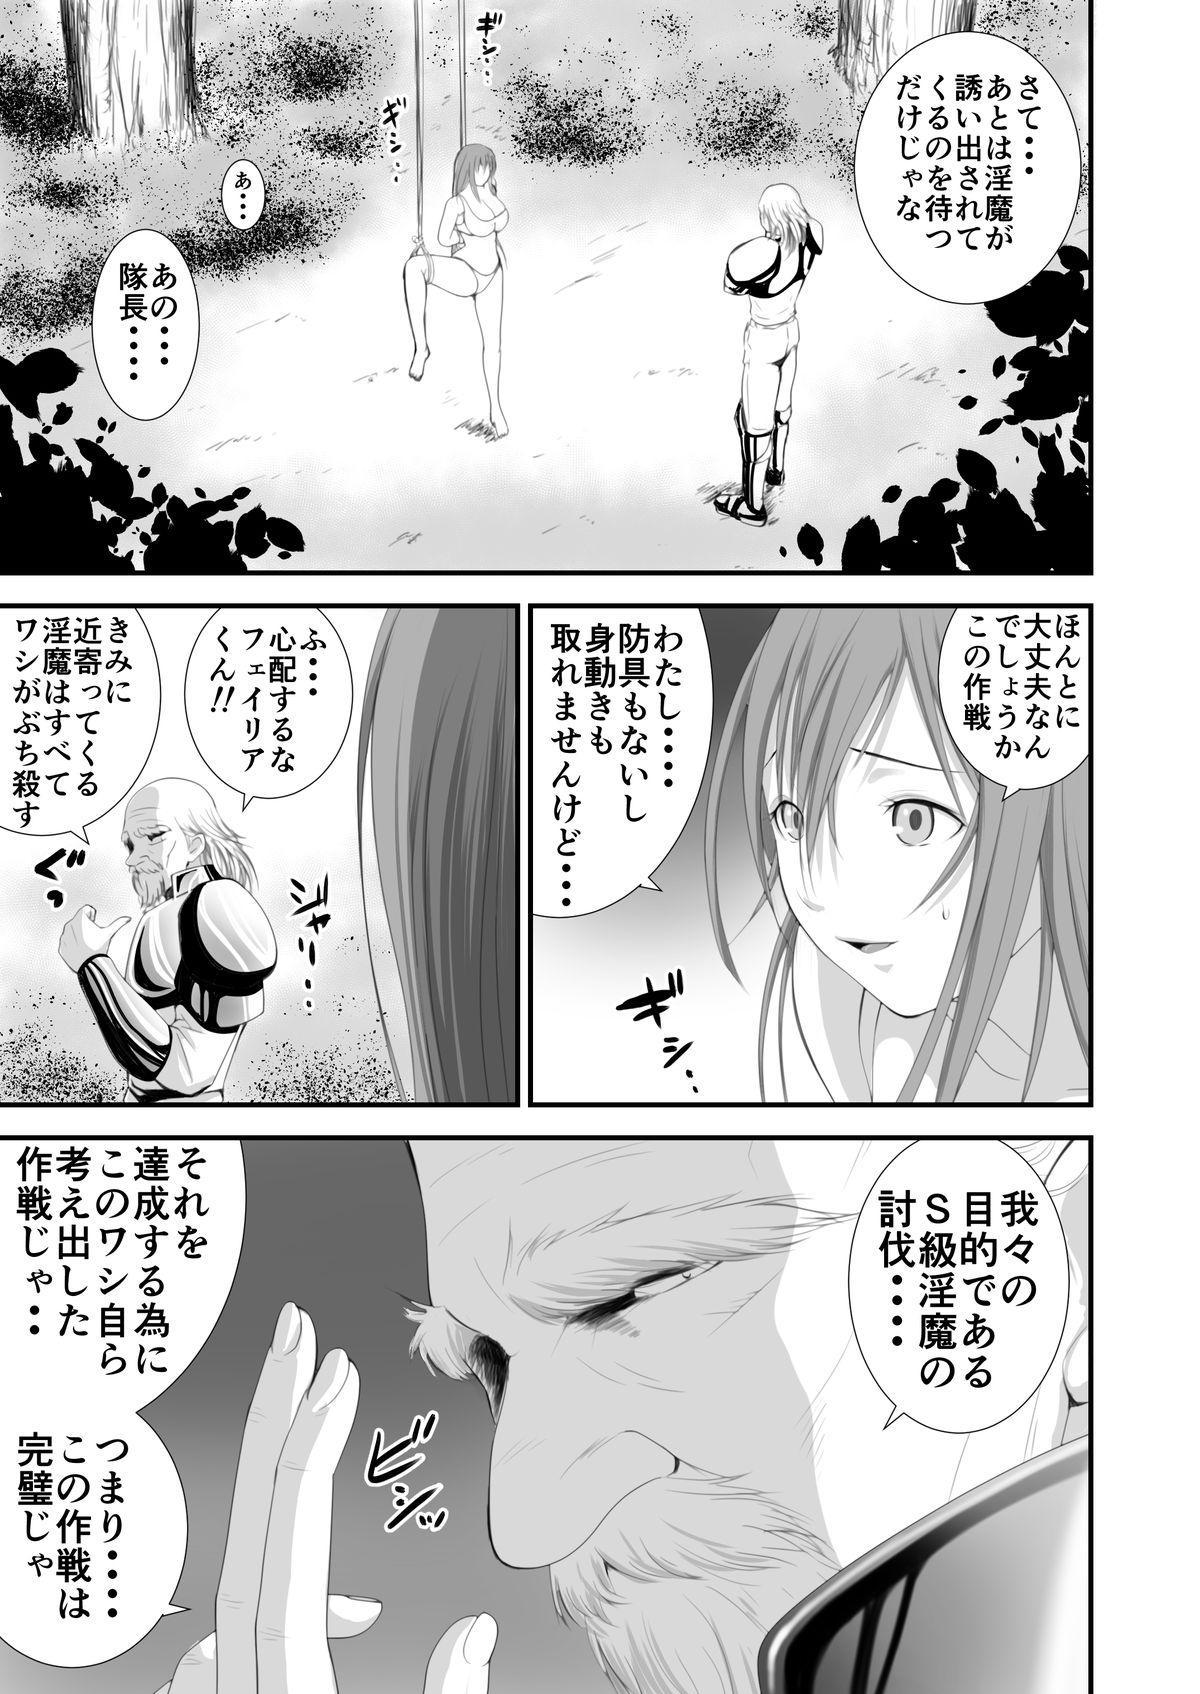 Inma Toubatsu Daisakusen Episode 3 6